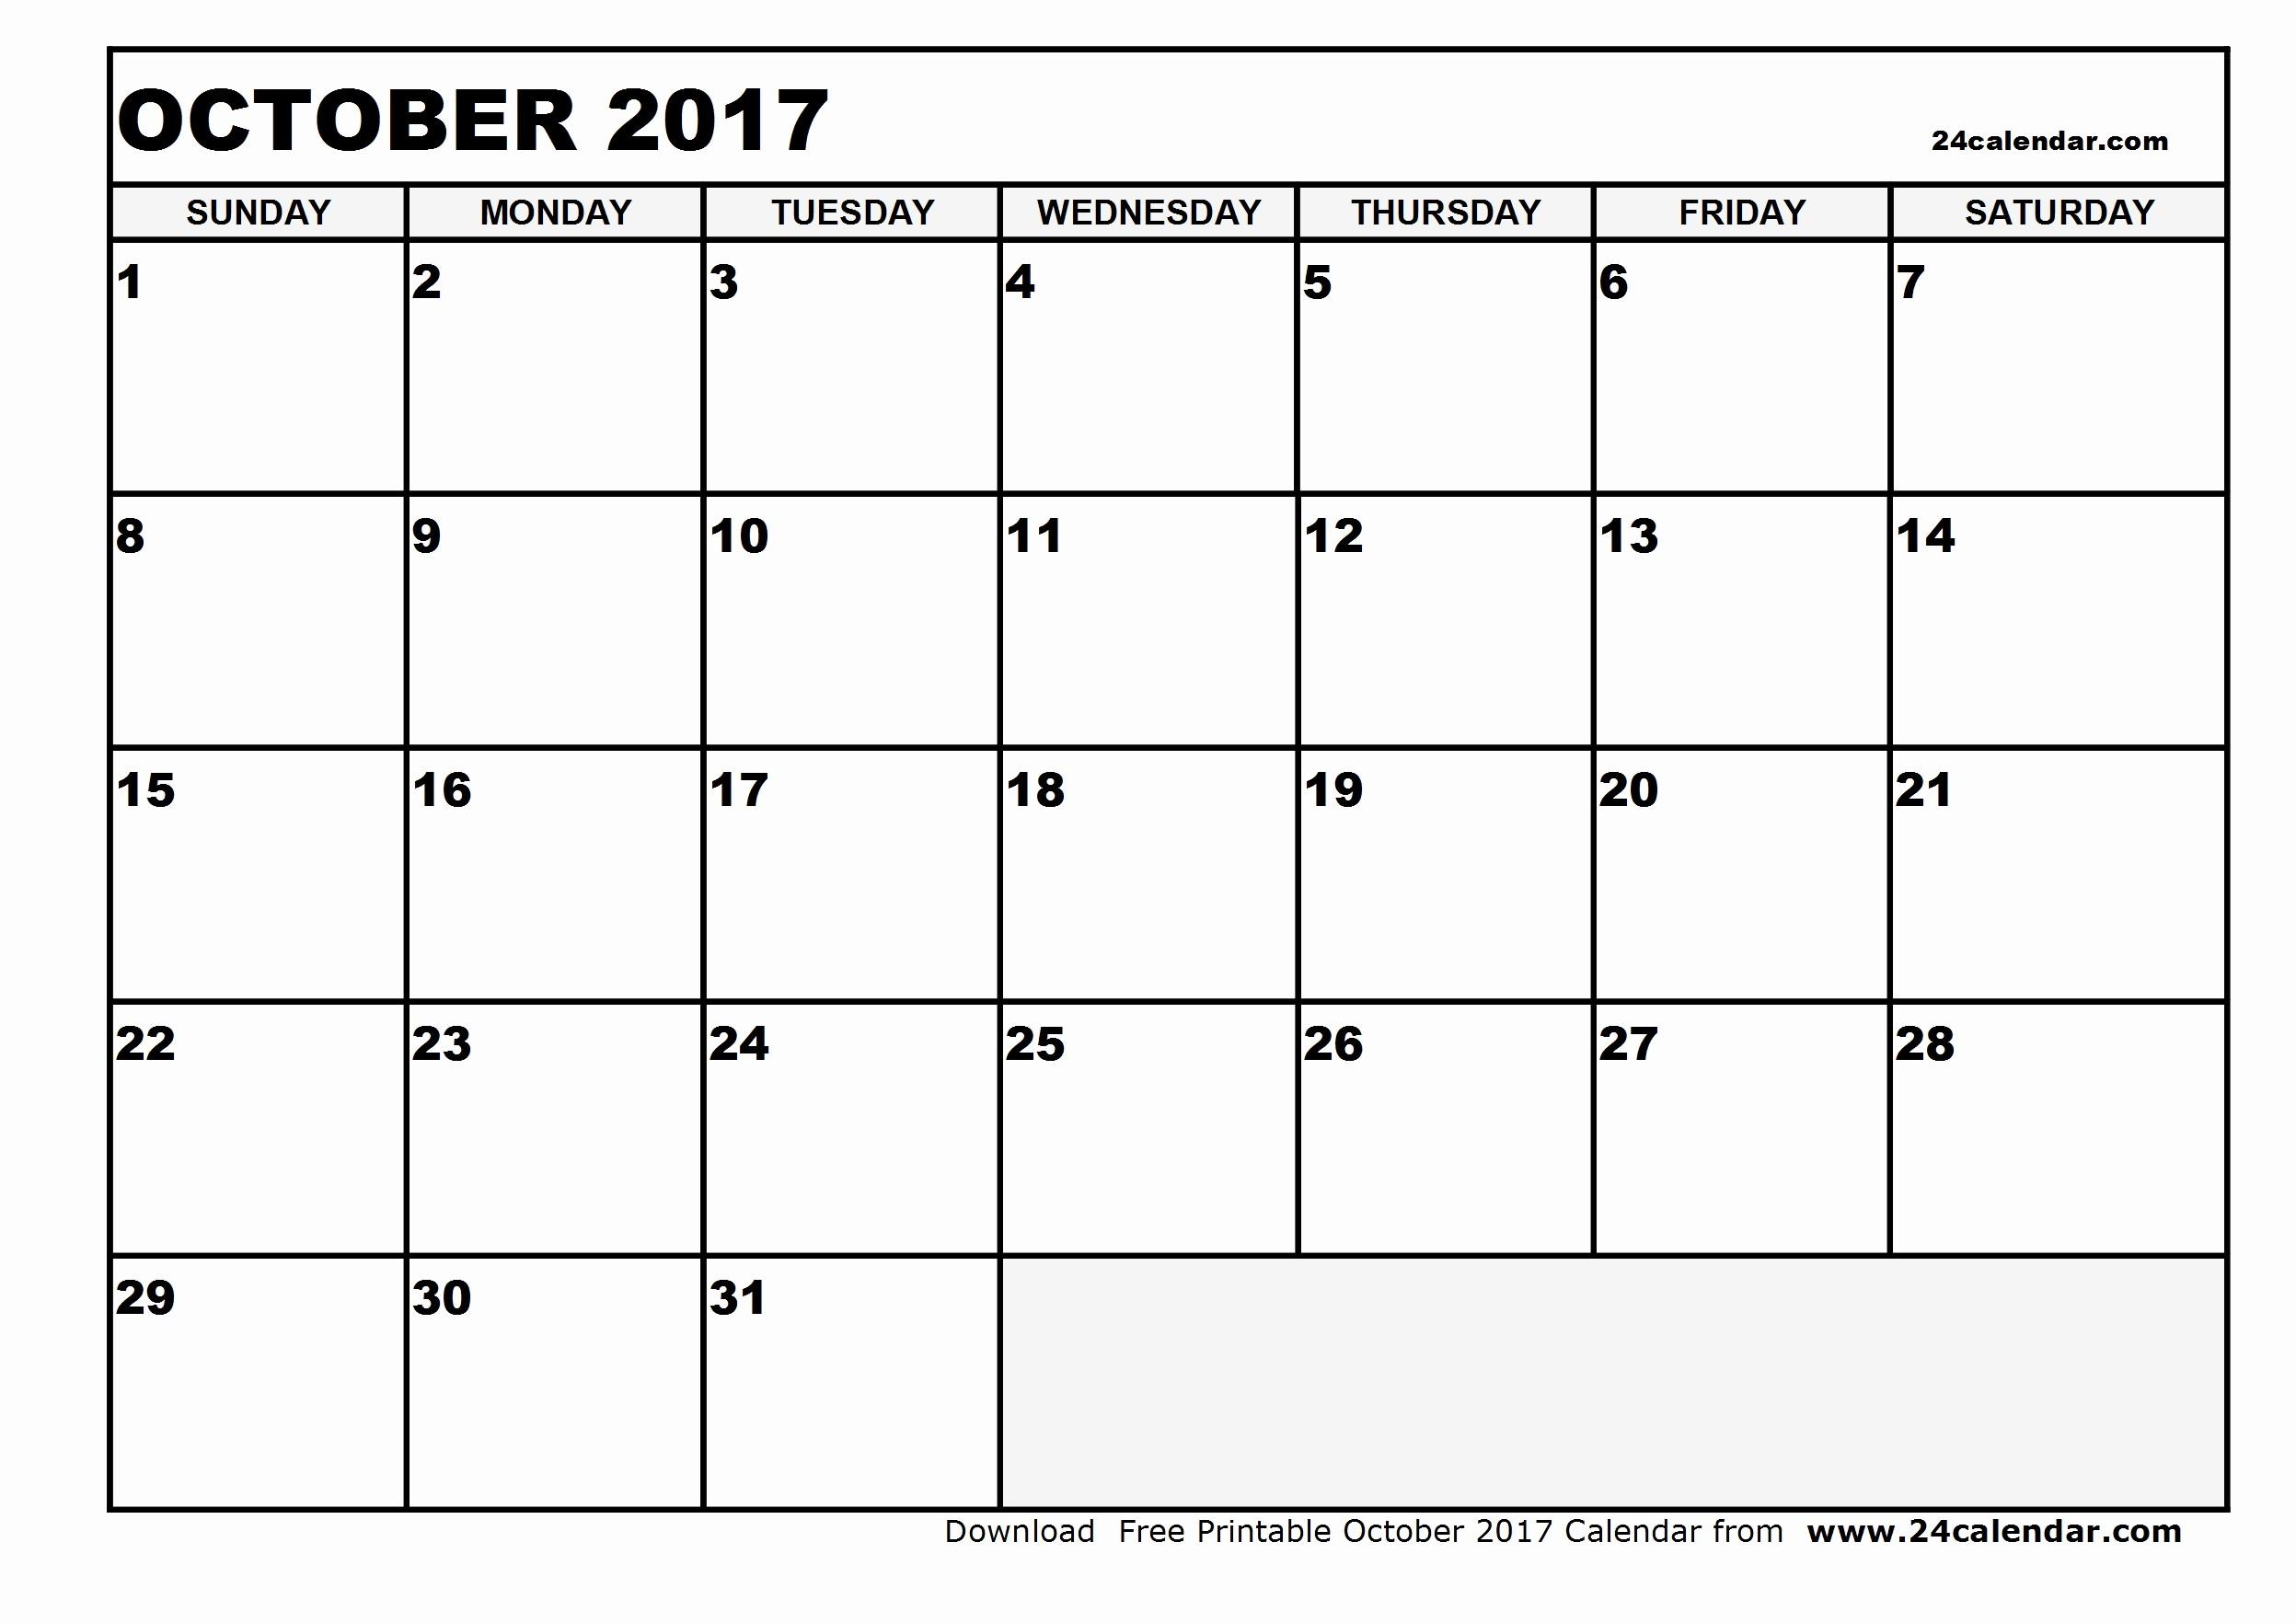 Blank May Calendar 2017 Printable Fresh Blank October 2017 Calendar In Printable format